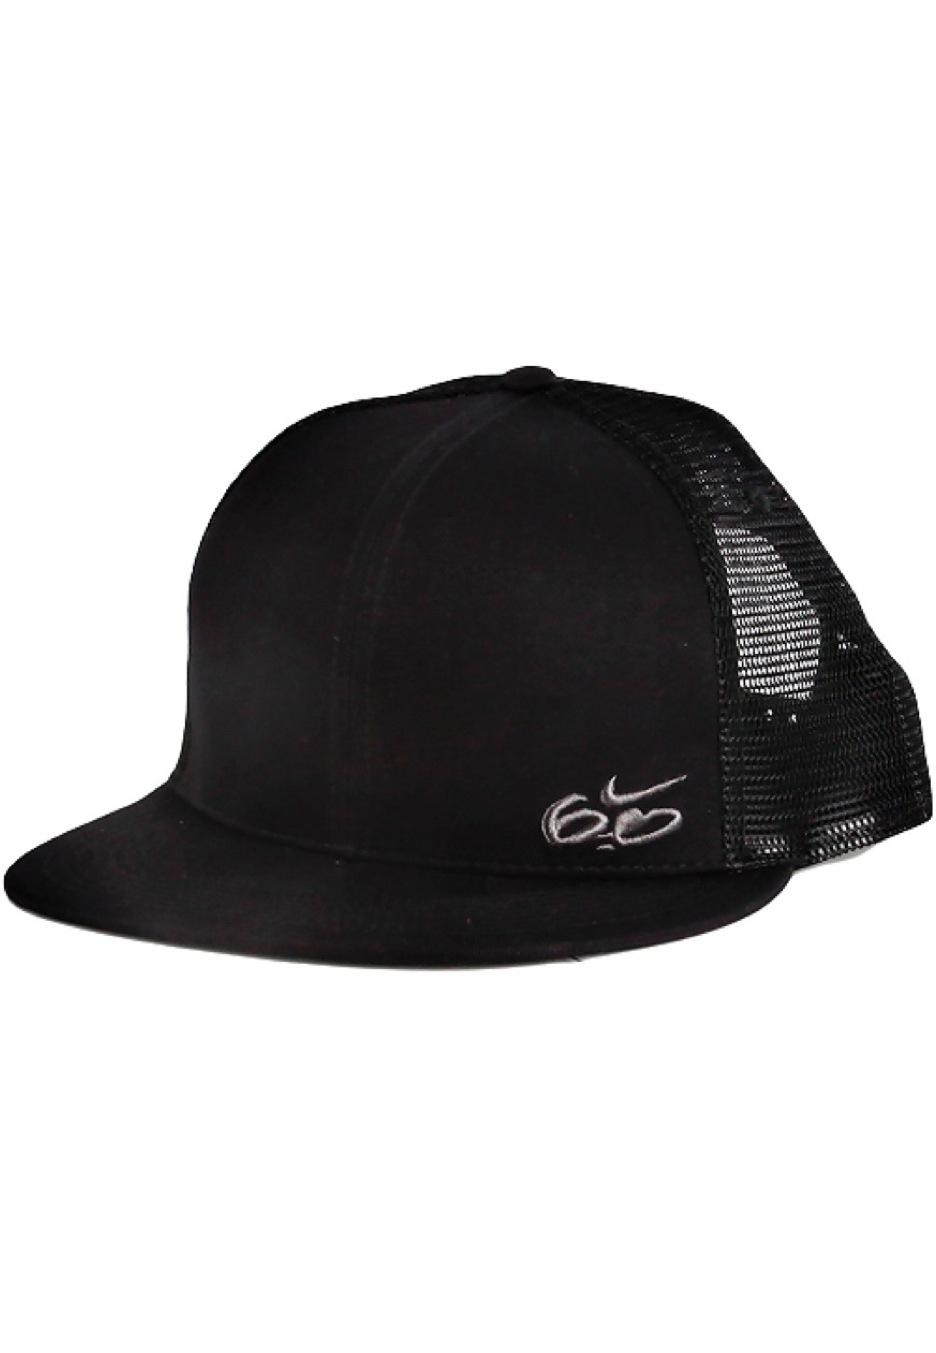 Nike 6.0 - 6.0 - Trucker Cap - Streetwear Shop - Impericon.com Worldwide 3d7a434c7cc